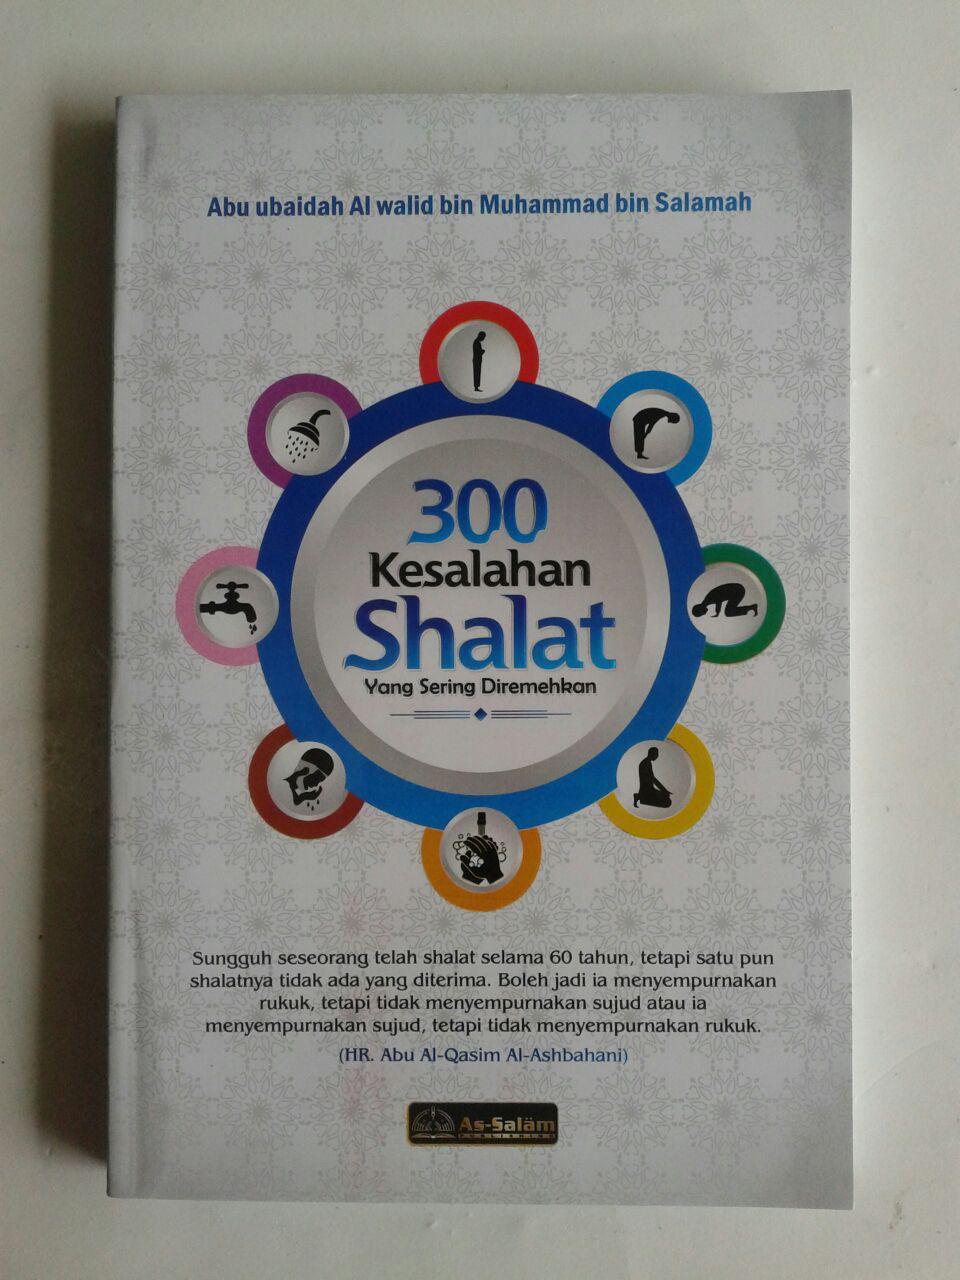 Buku 300 Kesalahan Shalat Yang Sering Diremehkan cover 2